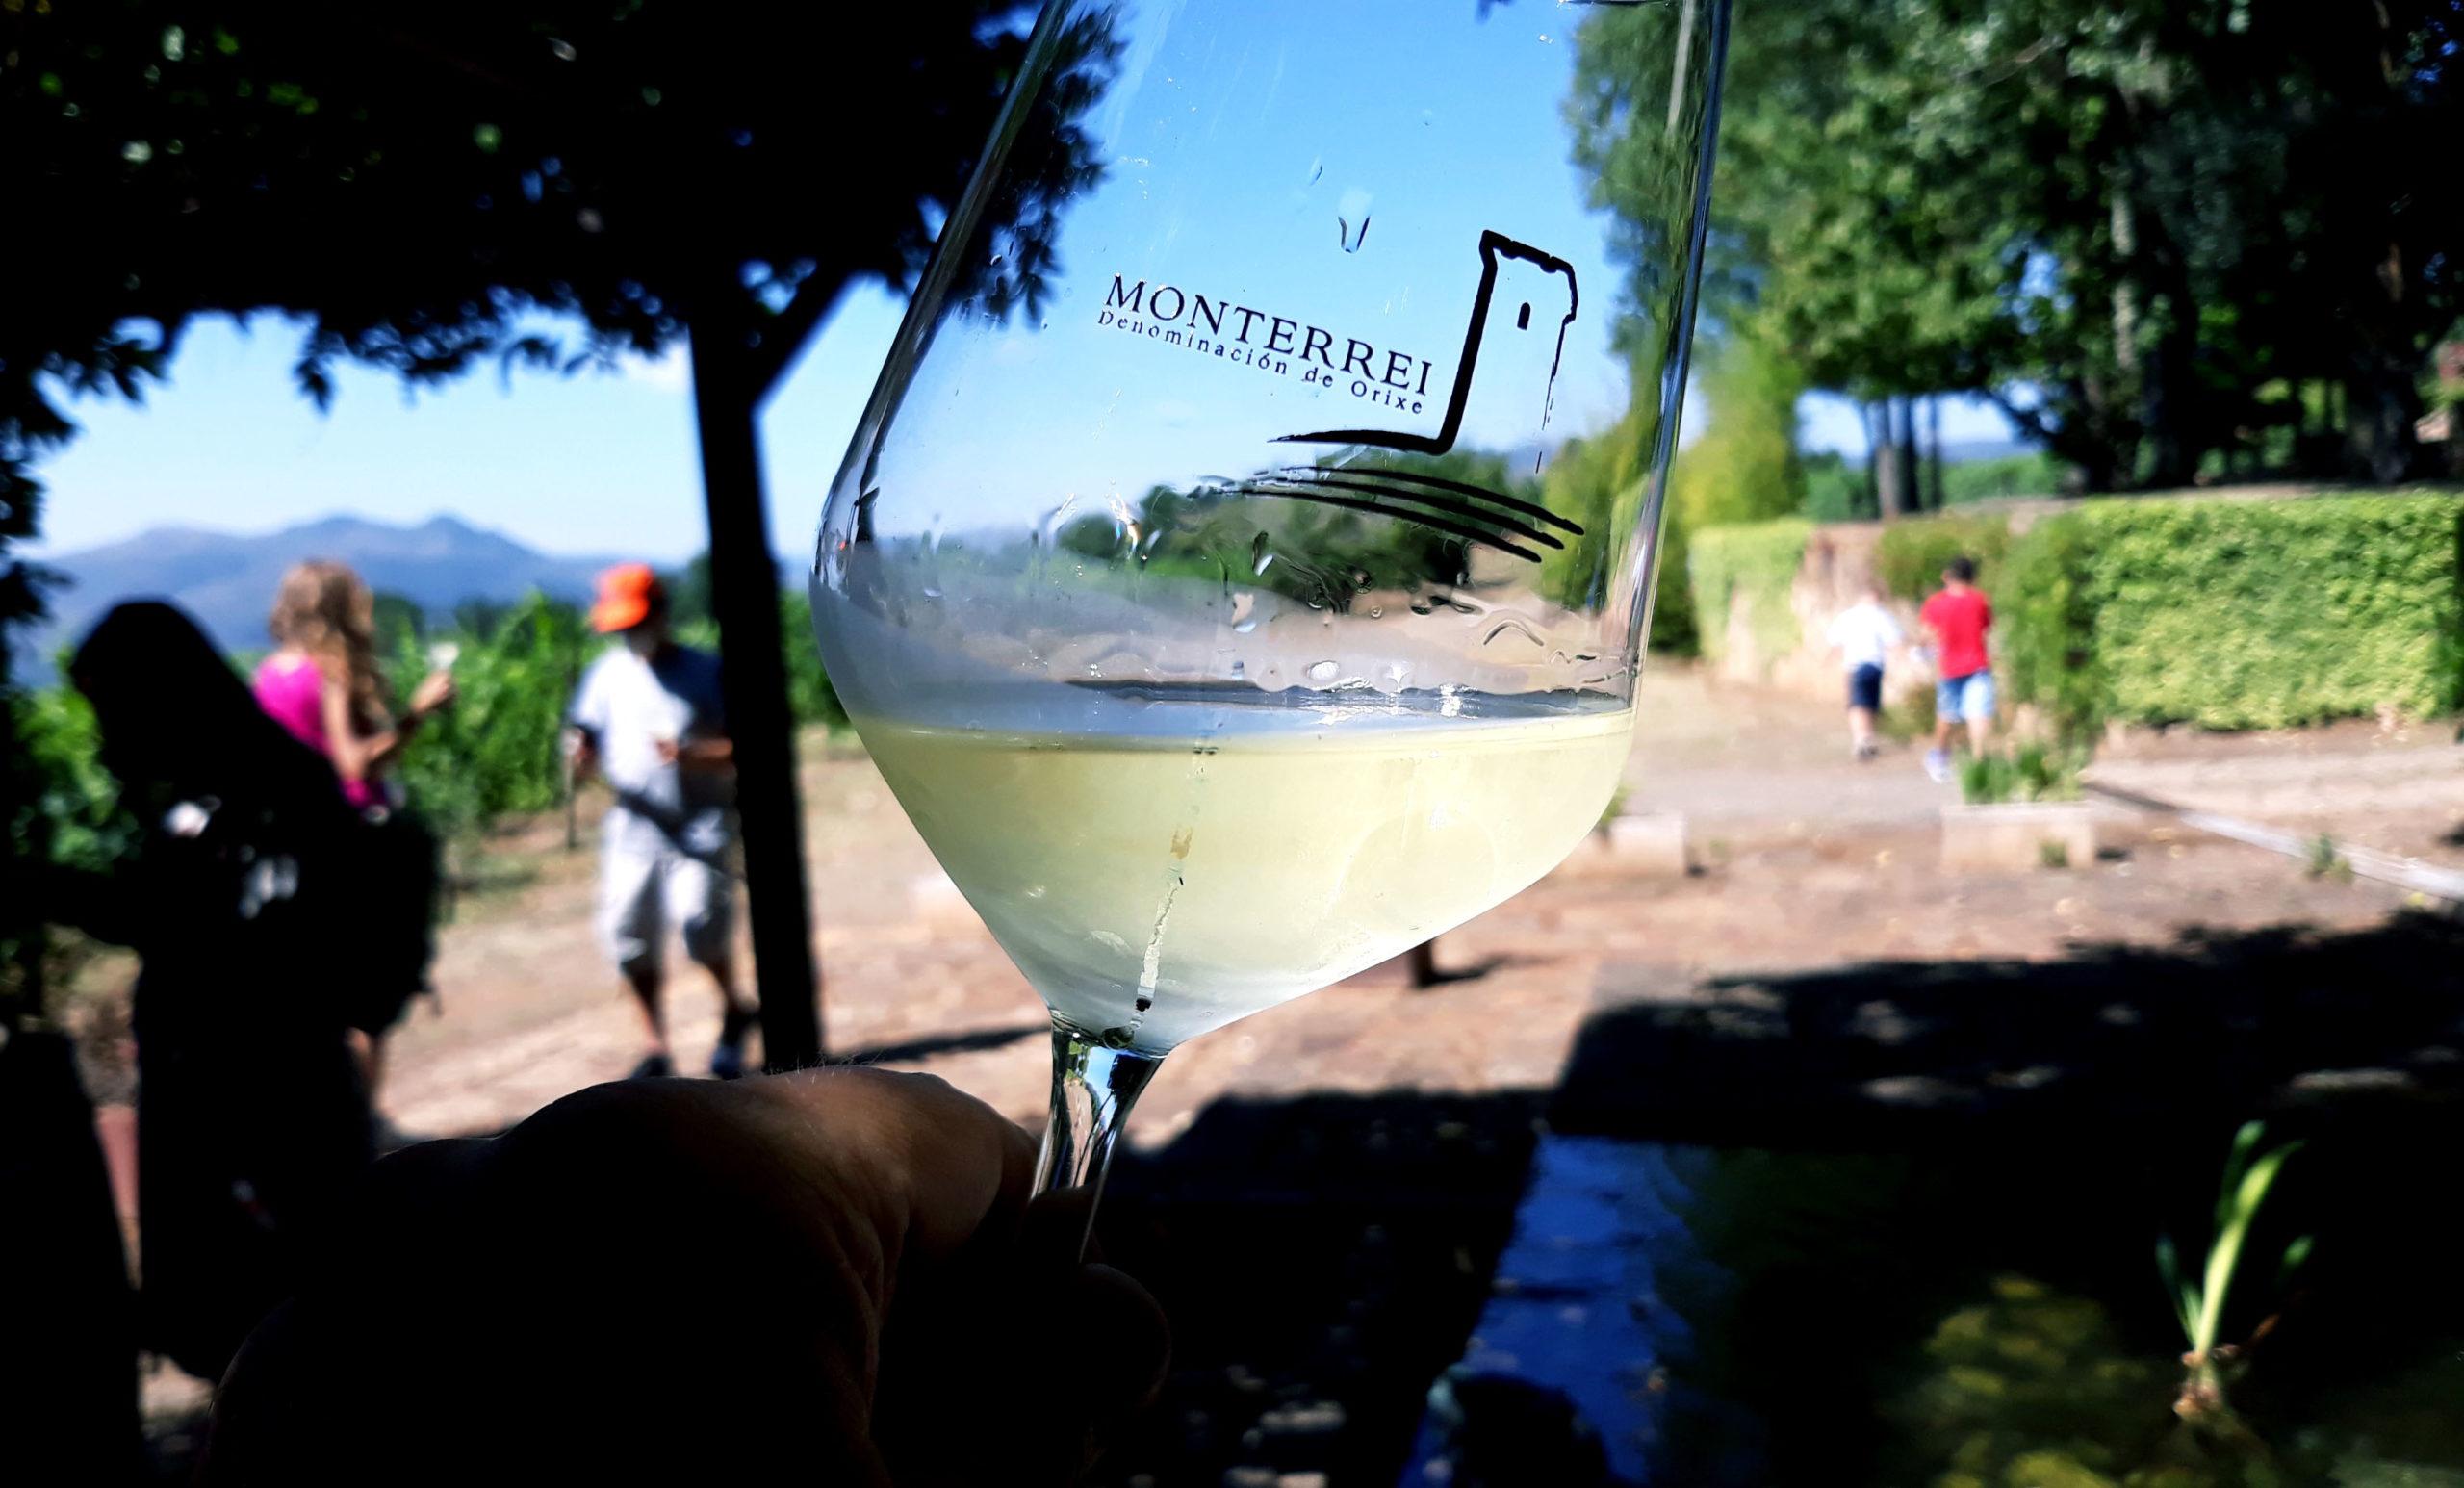 Patrimonio, paisajes y buen vino en la Ruta de Monterrei del Tren Turístico